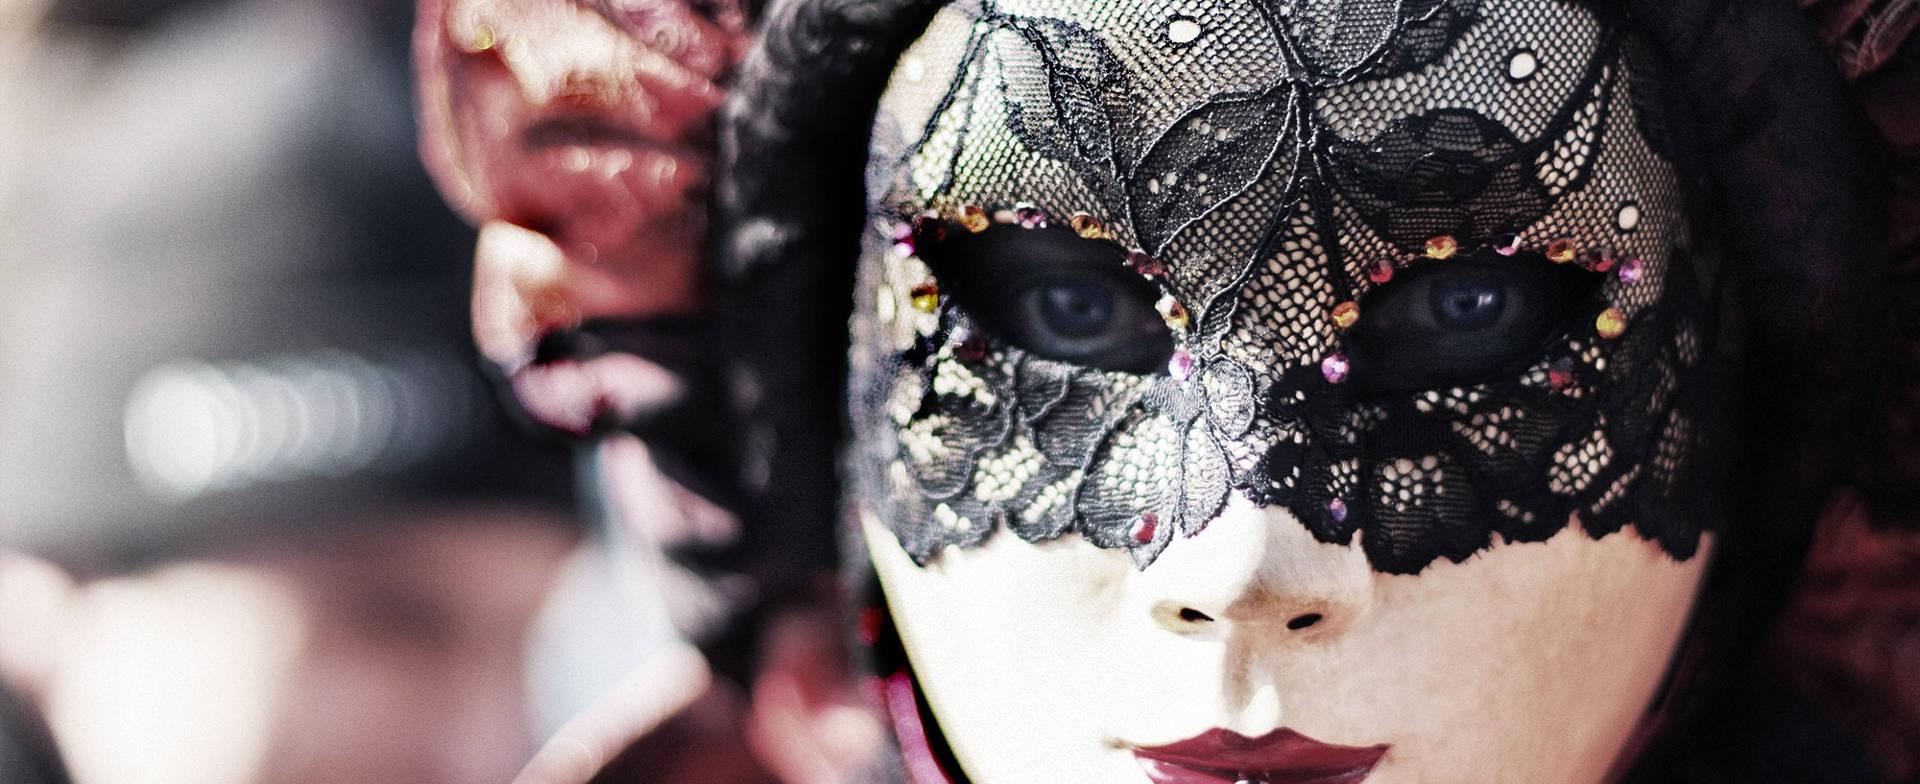 Karneval Carneval Venedig Brasilien Karibik USA Hochplateau Los Angeles San Francisco LA Monument Valley die reise reisen bielefeld reisebuero Wellnessreisen Familienreisen Kreuzfahrten Lastminute Mietwagen Lastminute